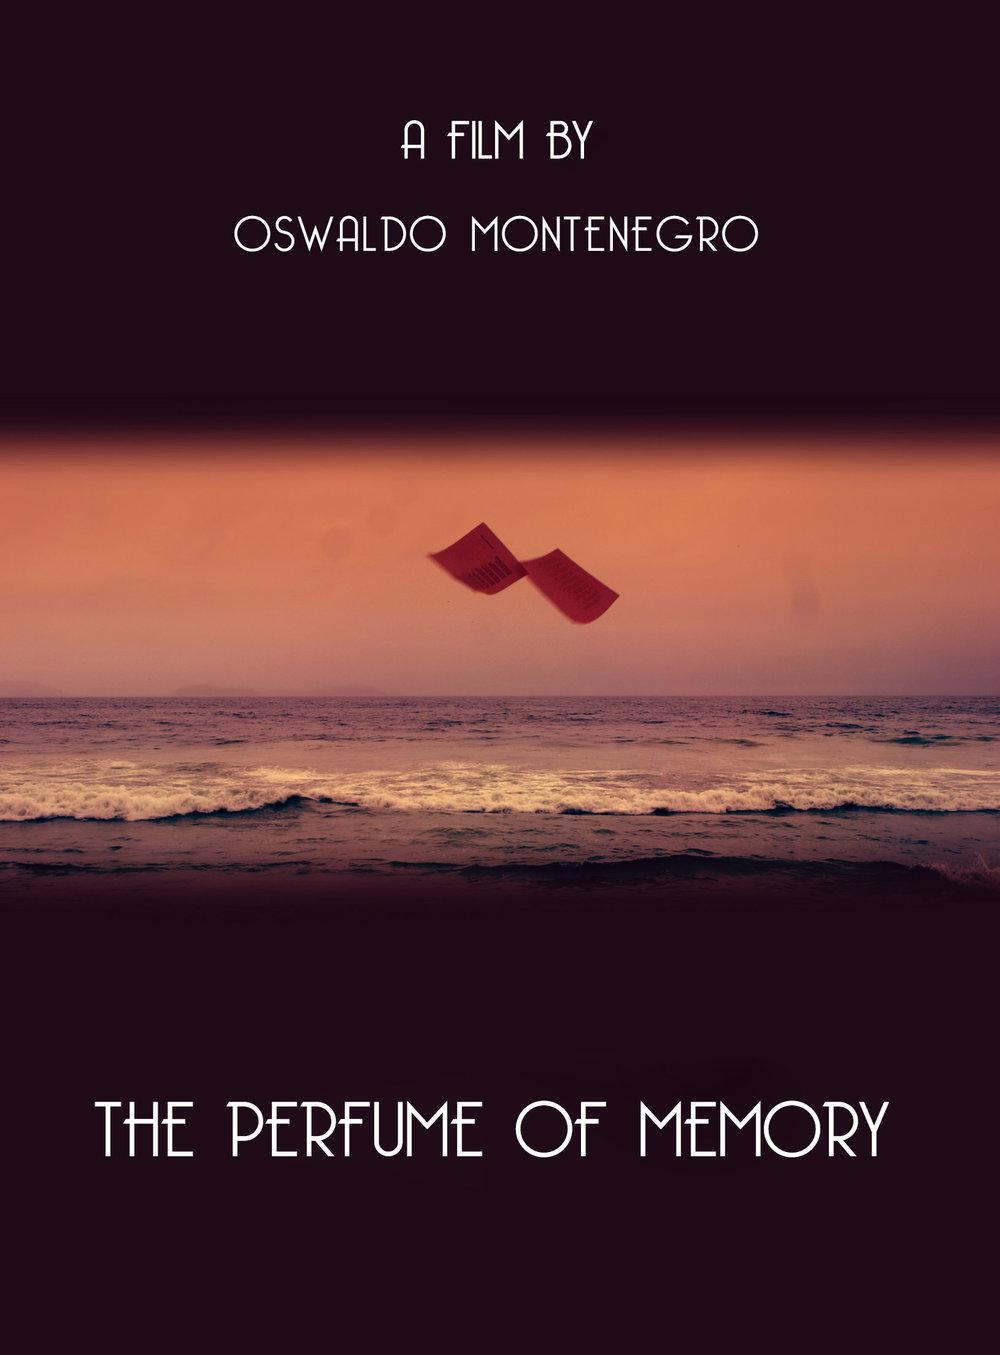 The-Perfume-Of-Memory-movie-poster.jpg